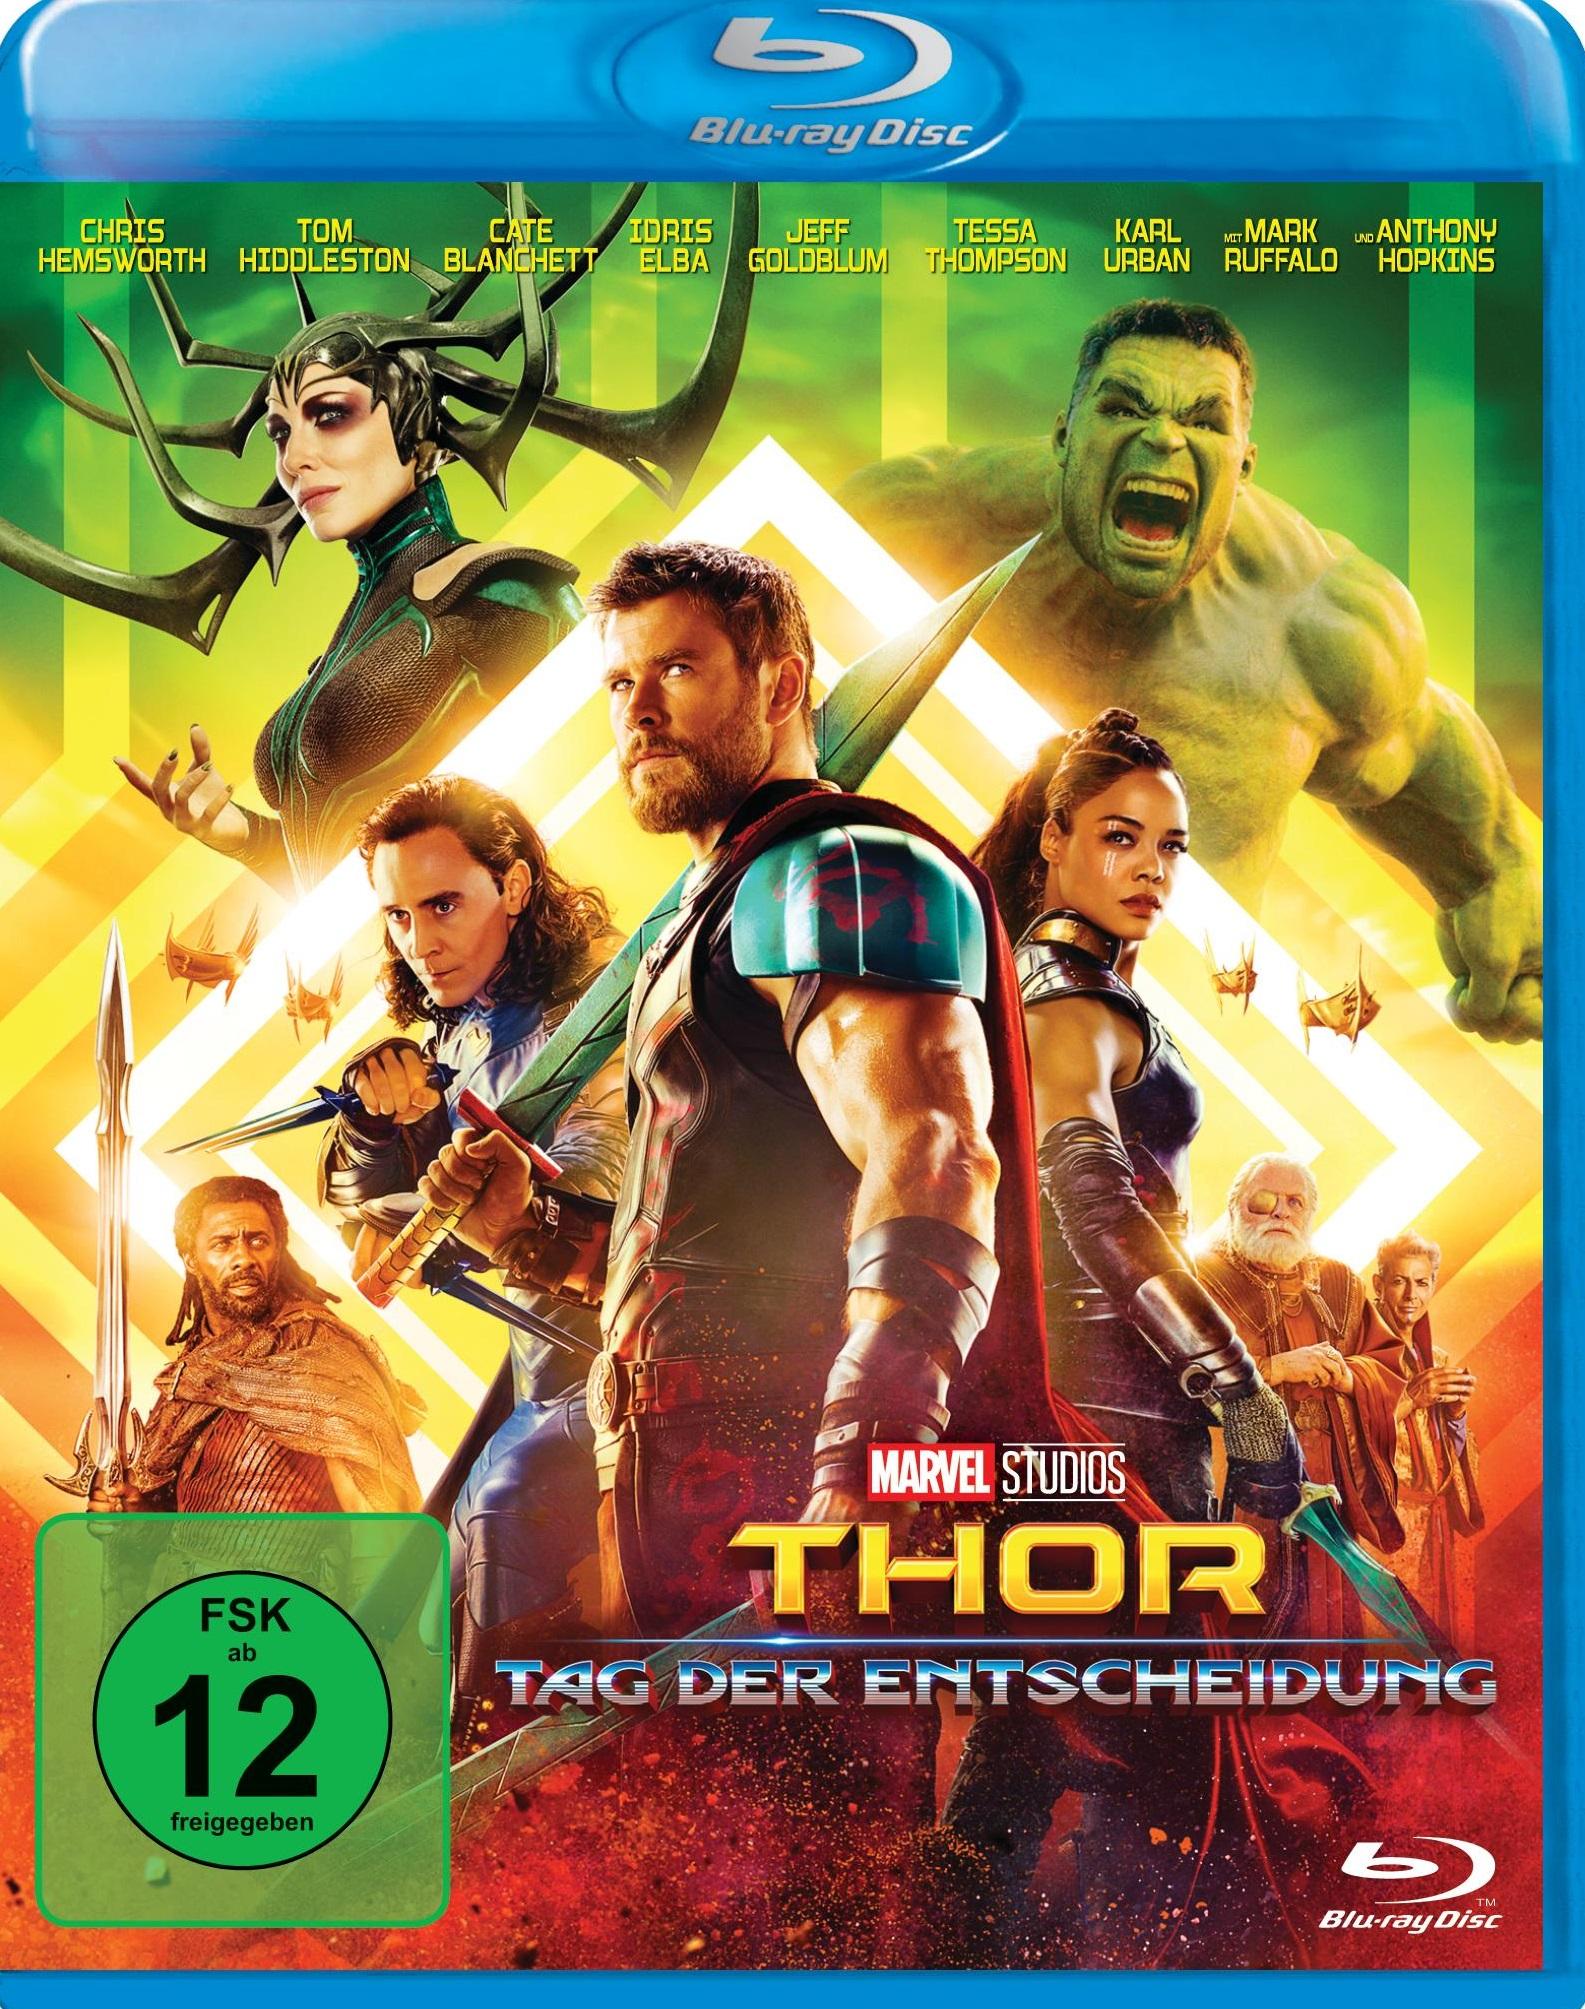 Uhd Blu Ray Kritik Thor Tag Der Entscheidung 4k Review Rezension